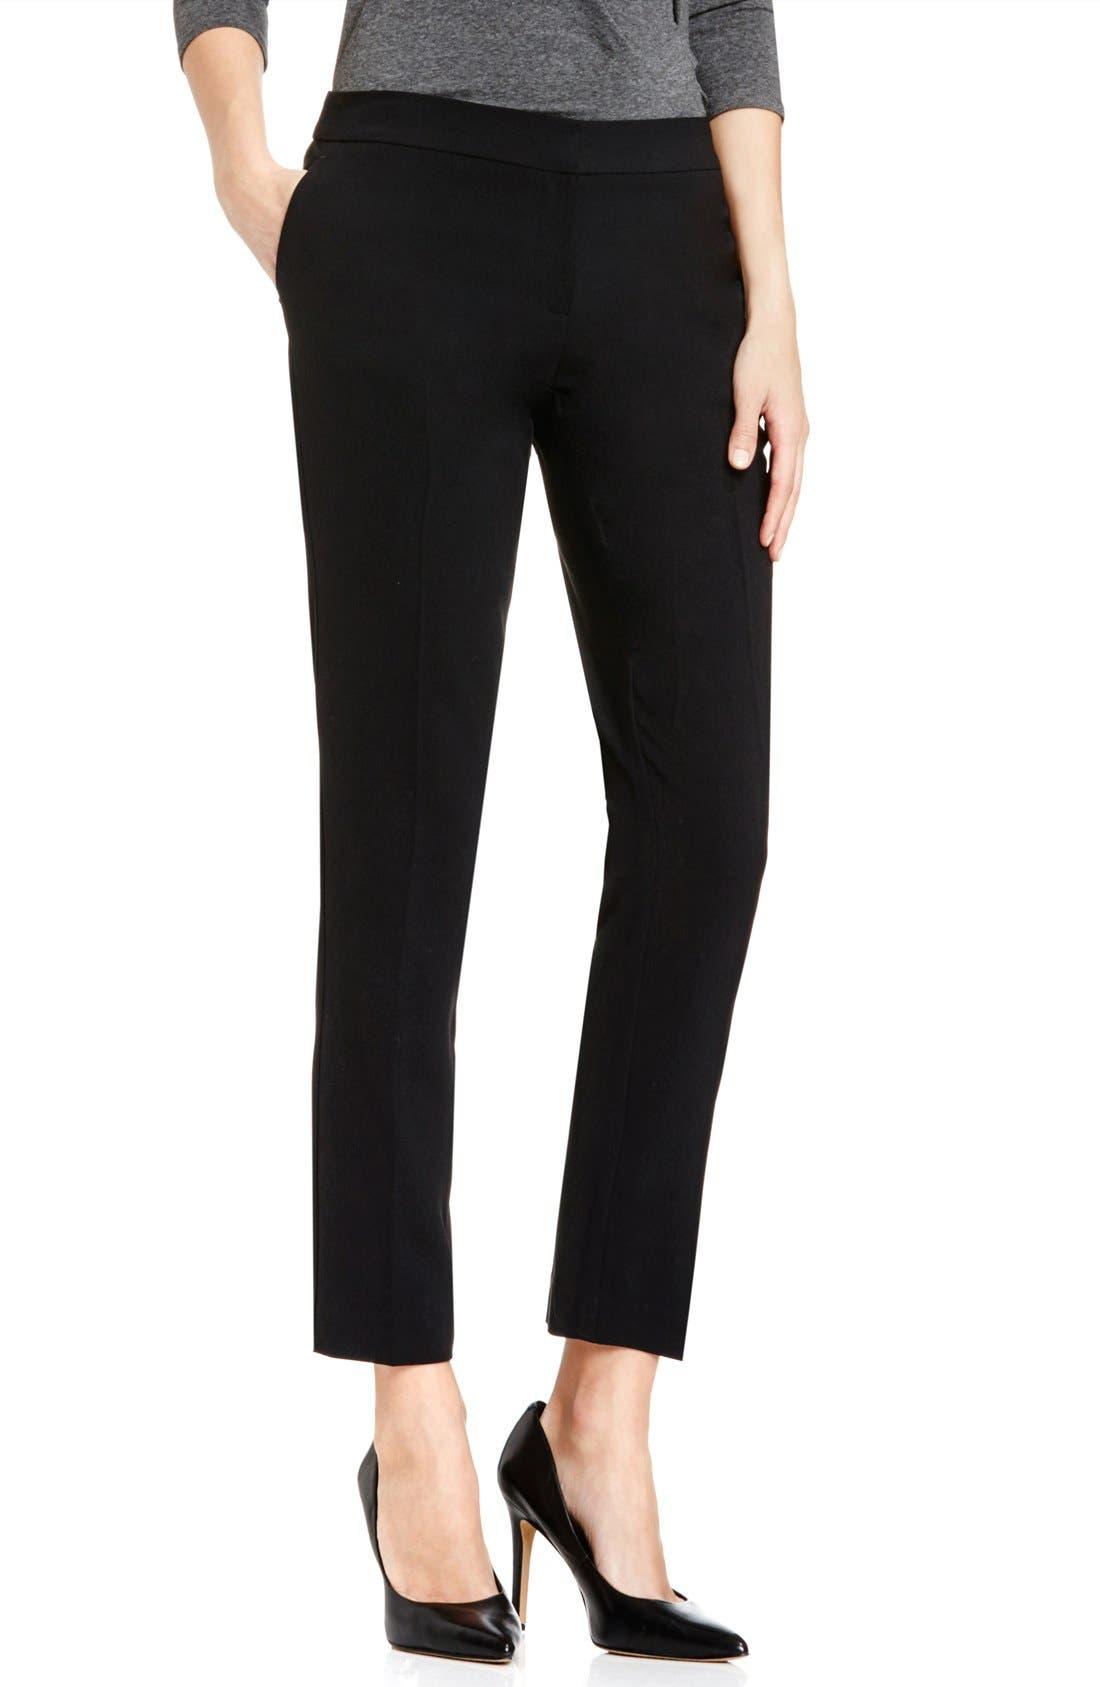 Womens Black Ankle Pants DMzUzX5C